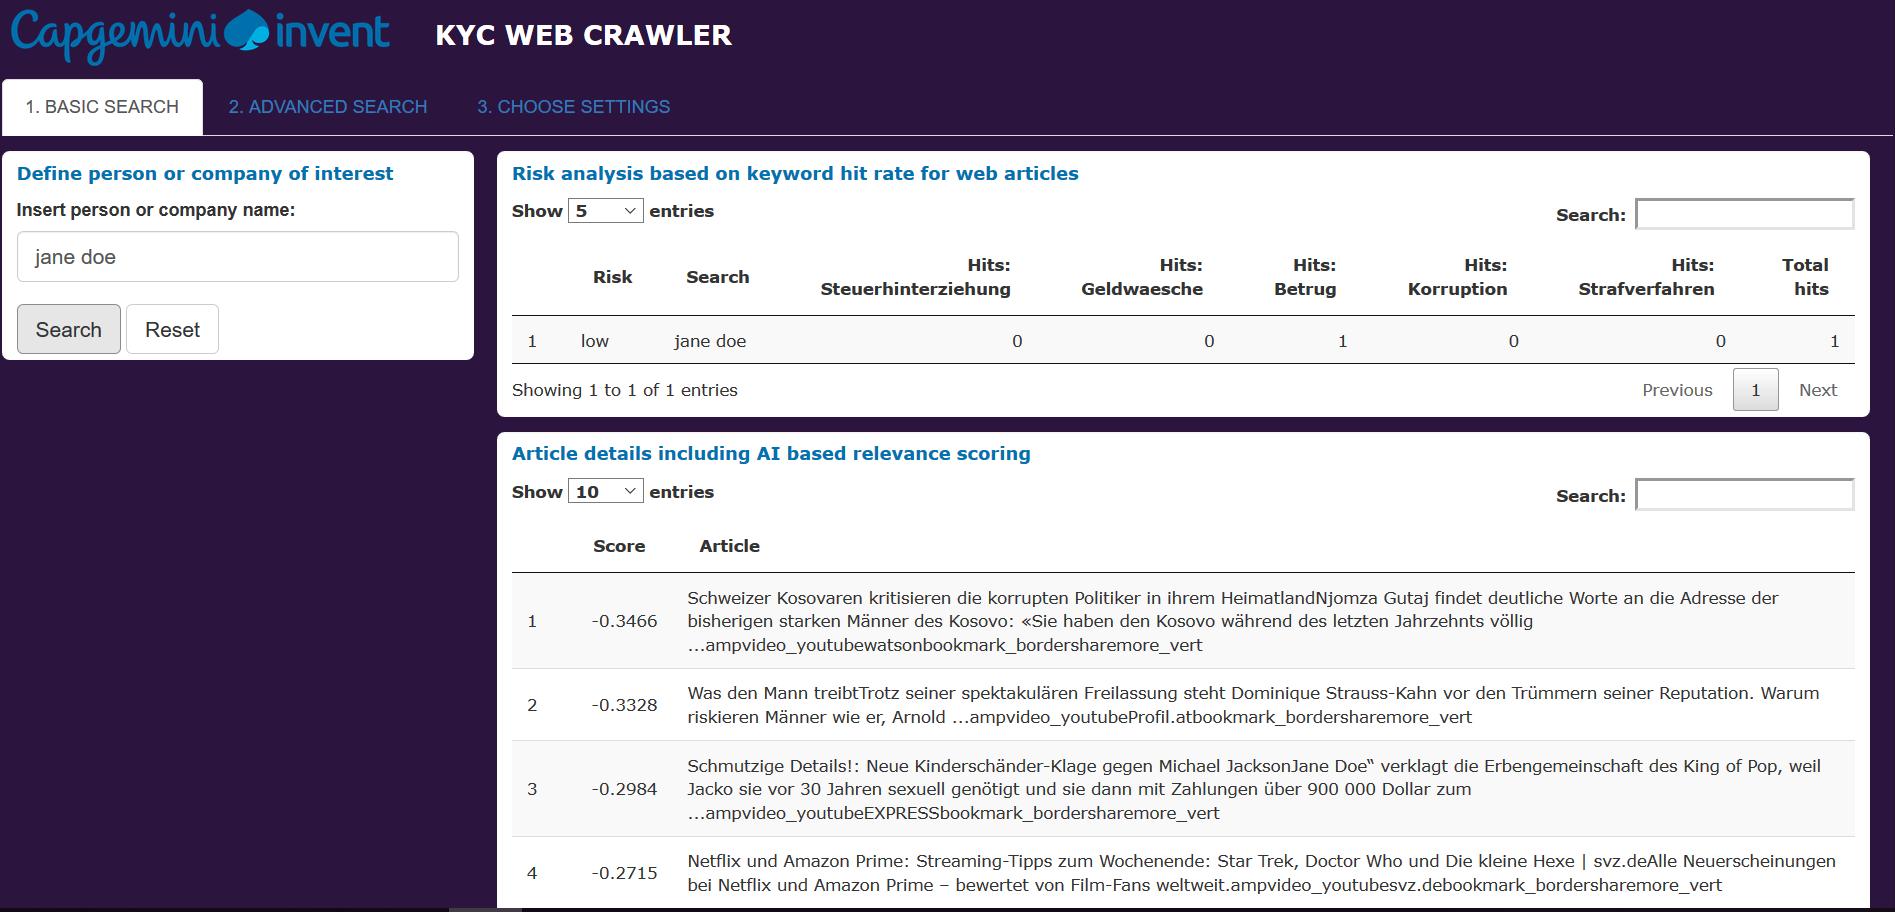 KYC Web Crawler, entwickelt von AI Garage, Capgemini Invent